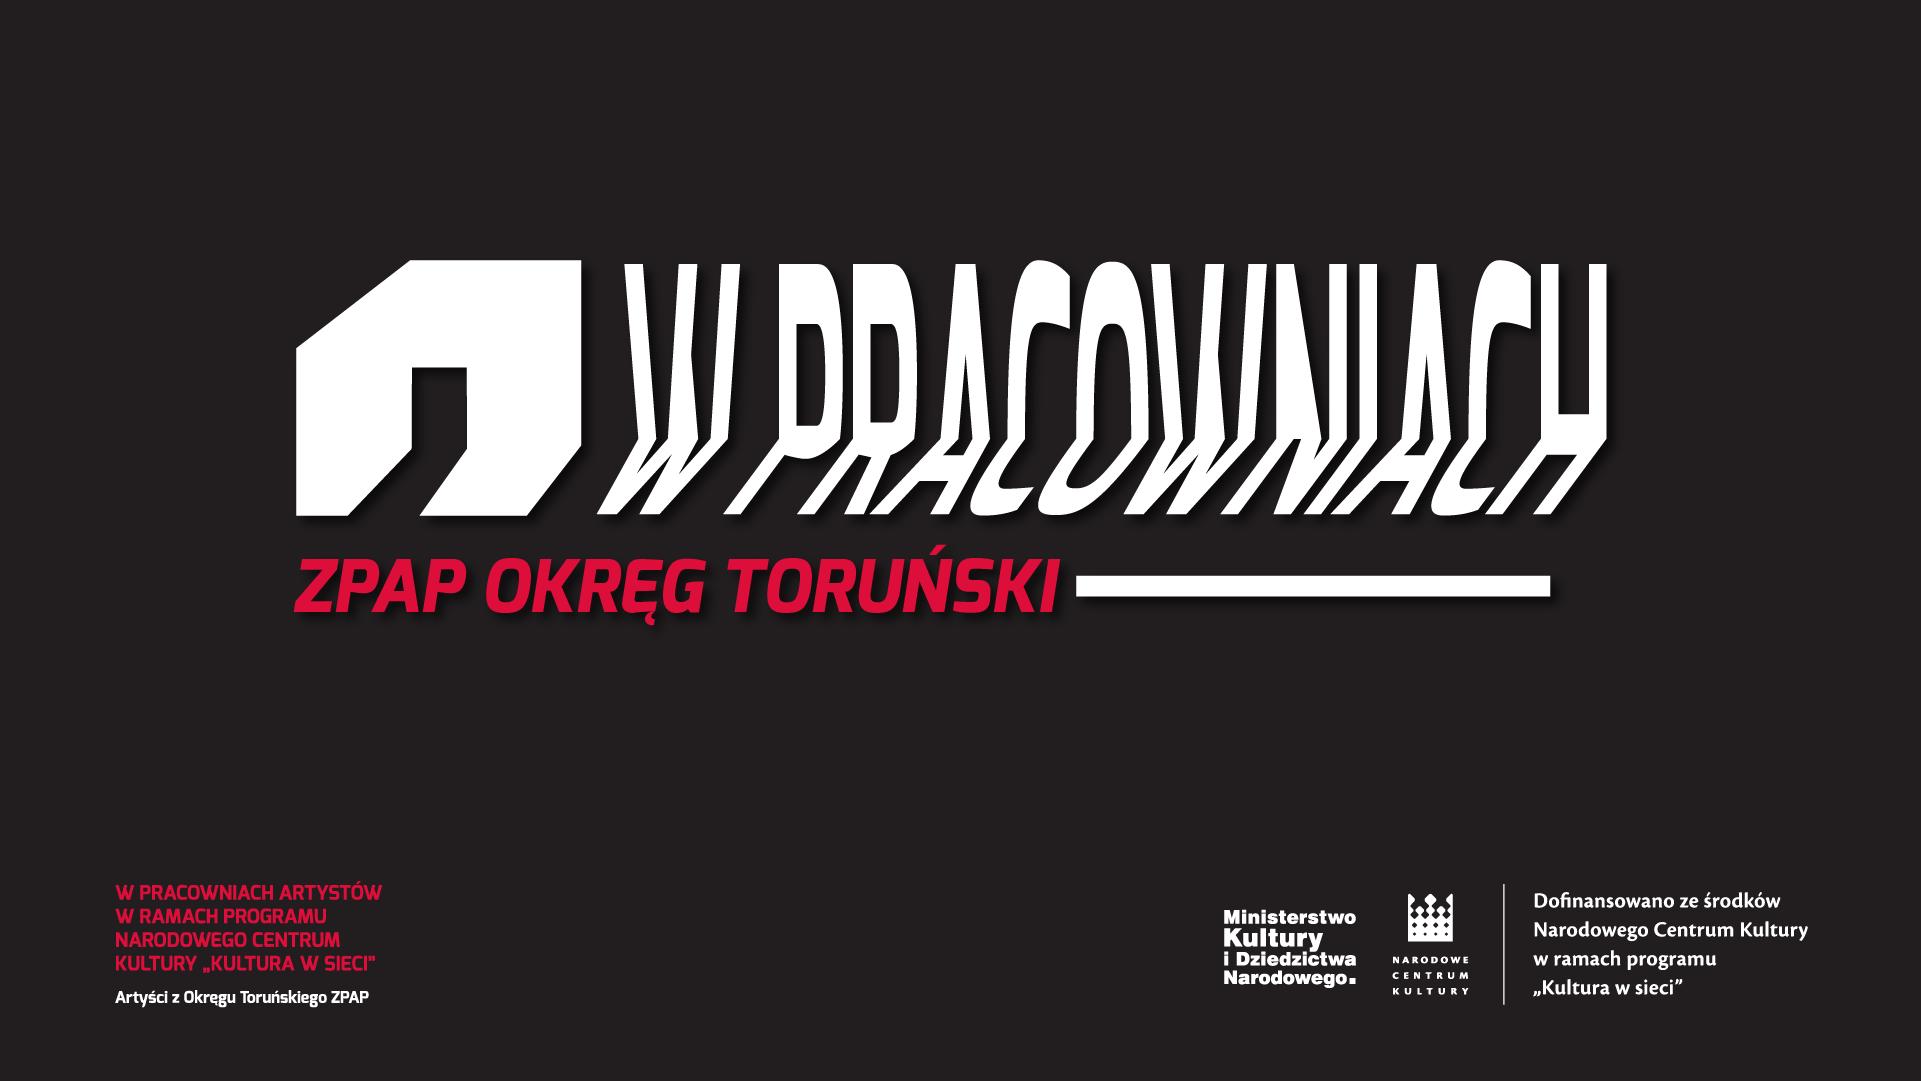 ZPAP Okręg Toruński